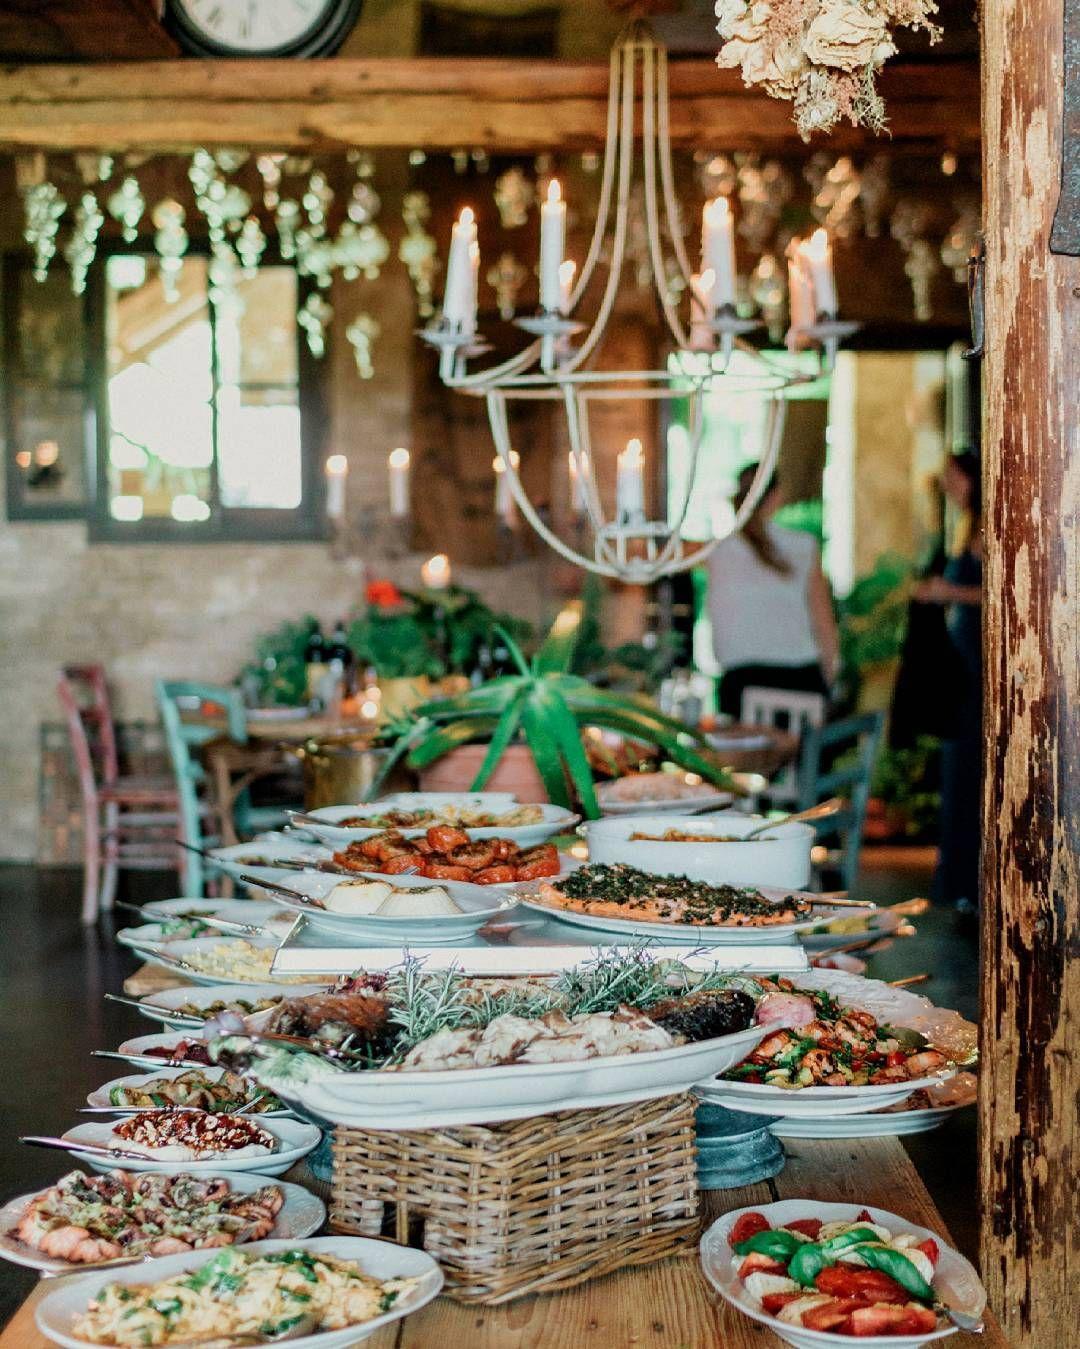 Matrimonio Country Chic Treviso : Locanda rosa rosae breda di piave treviso buffet matrimonio